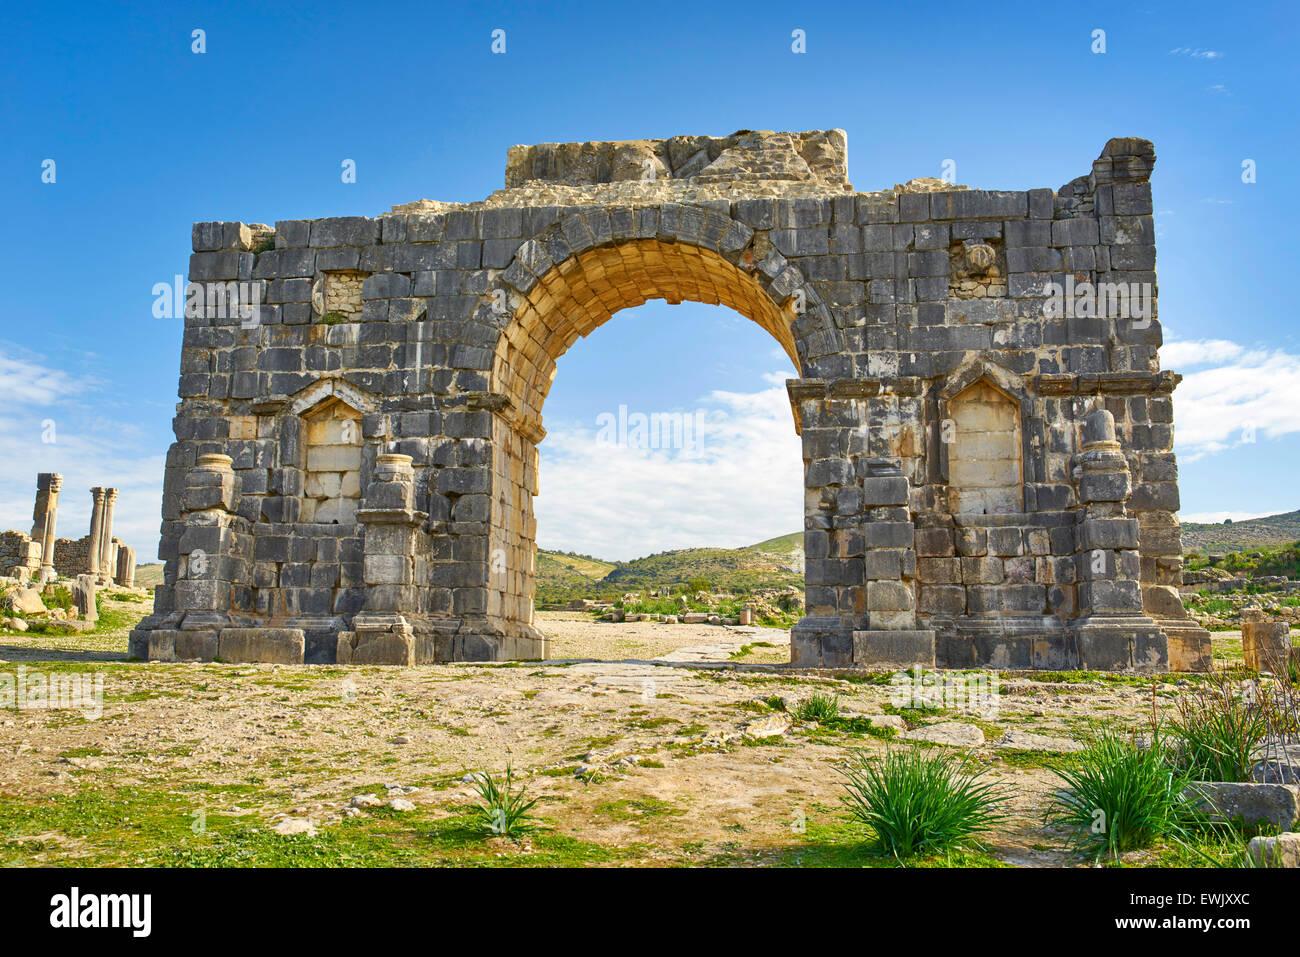 Roman ruins of Volubilis near Meknes, Triumphal Arch, UNESCO, Morocco, Africa - Stock Image